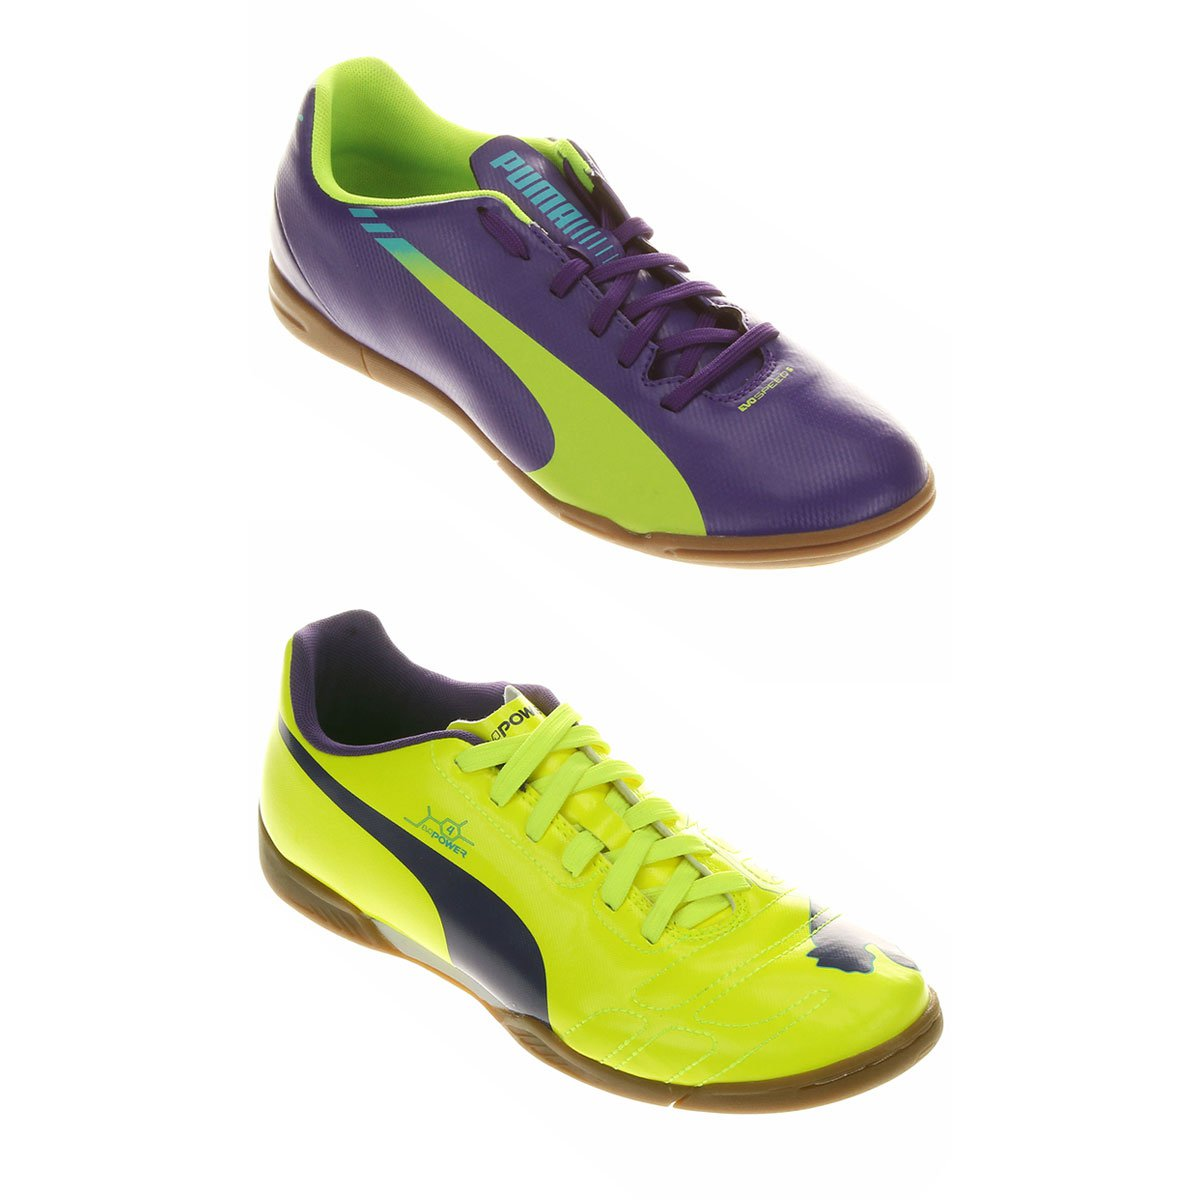 db62f0419fa Kit Chuteira Puma Evopower 4 IT + Chuteira Puma Evospeed 5.3 IT Futsal -  Compre Agora